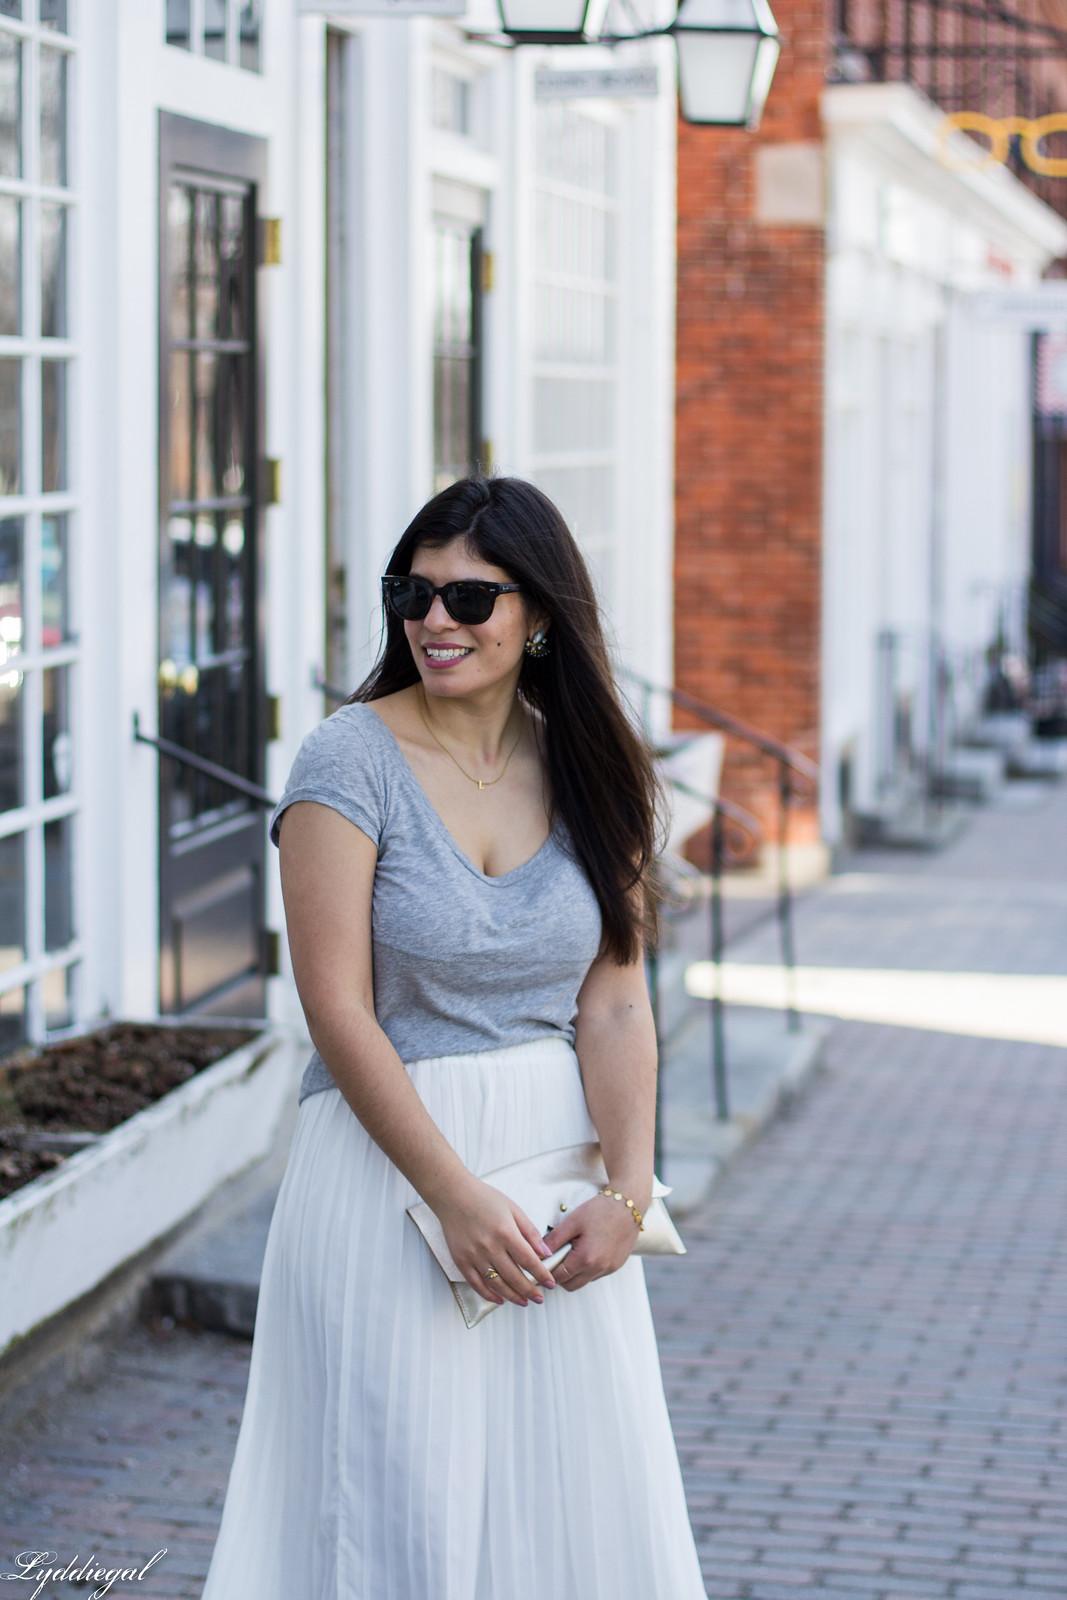 white pleated midi skirt, grey tee, nude heels, scalloped clutch-12.jpg